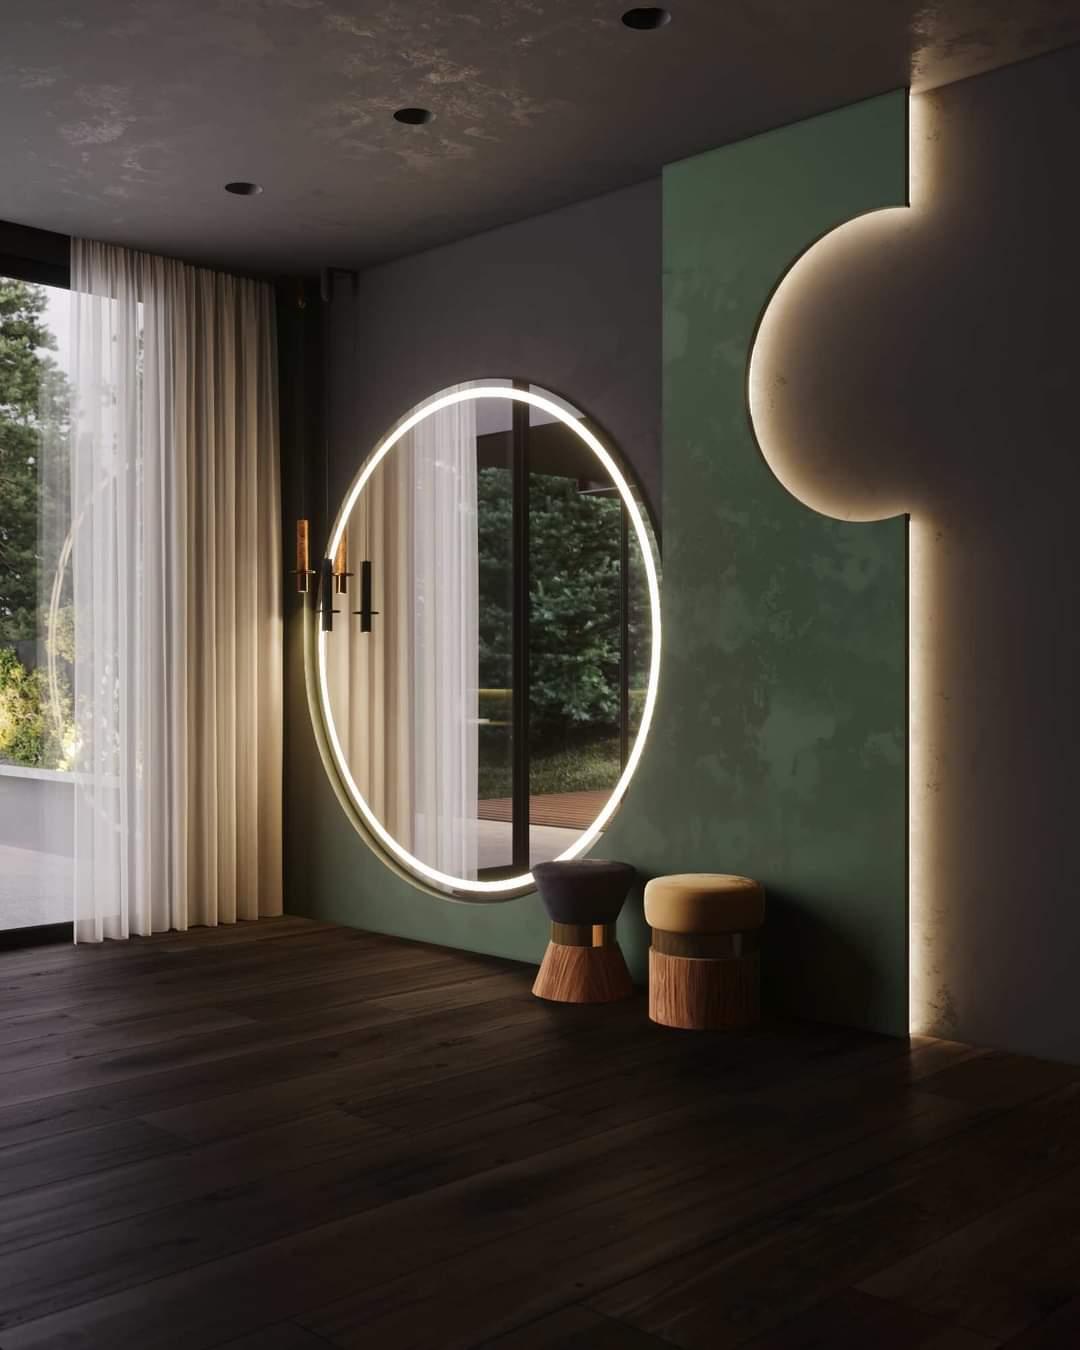 Spacious Living Room Set Up - Source: Kireevaaanna